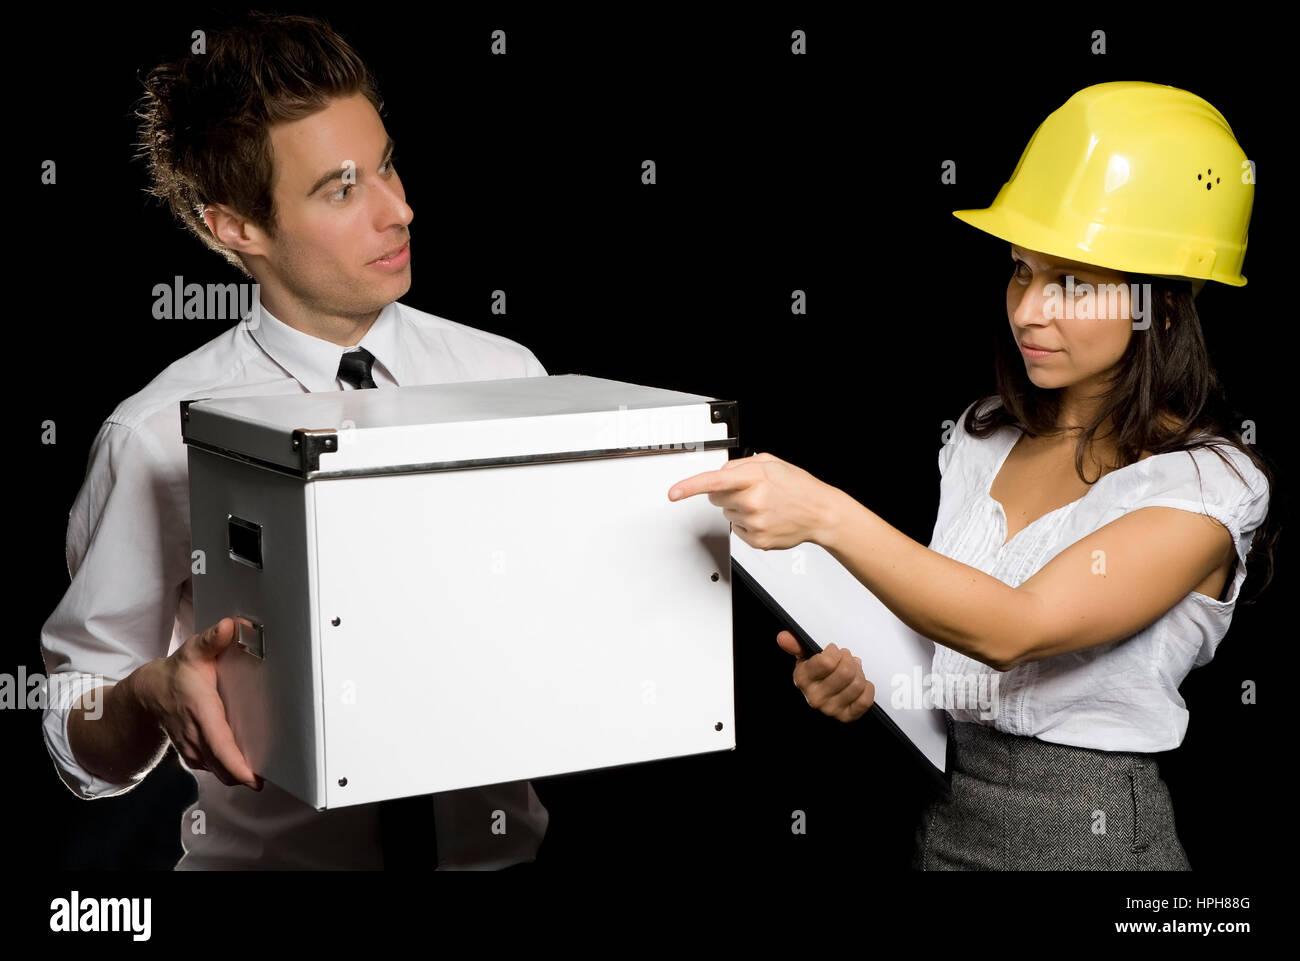 Geschaeftsfrau mit Bauarbeiterhelm deligiert geschaeftsmann - businesspeople, Model released - Stock Image